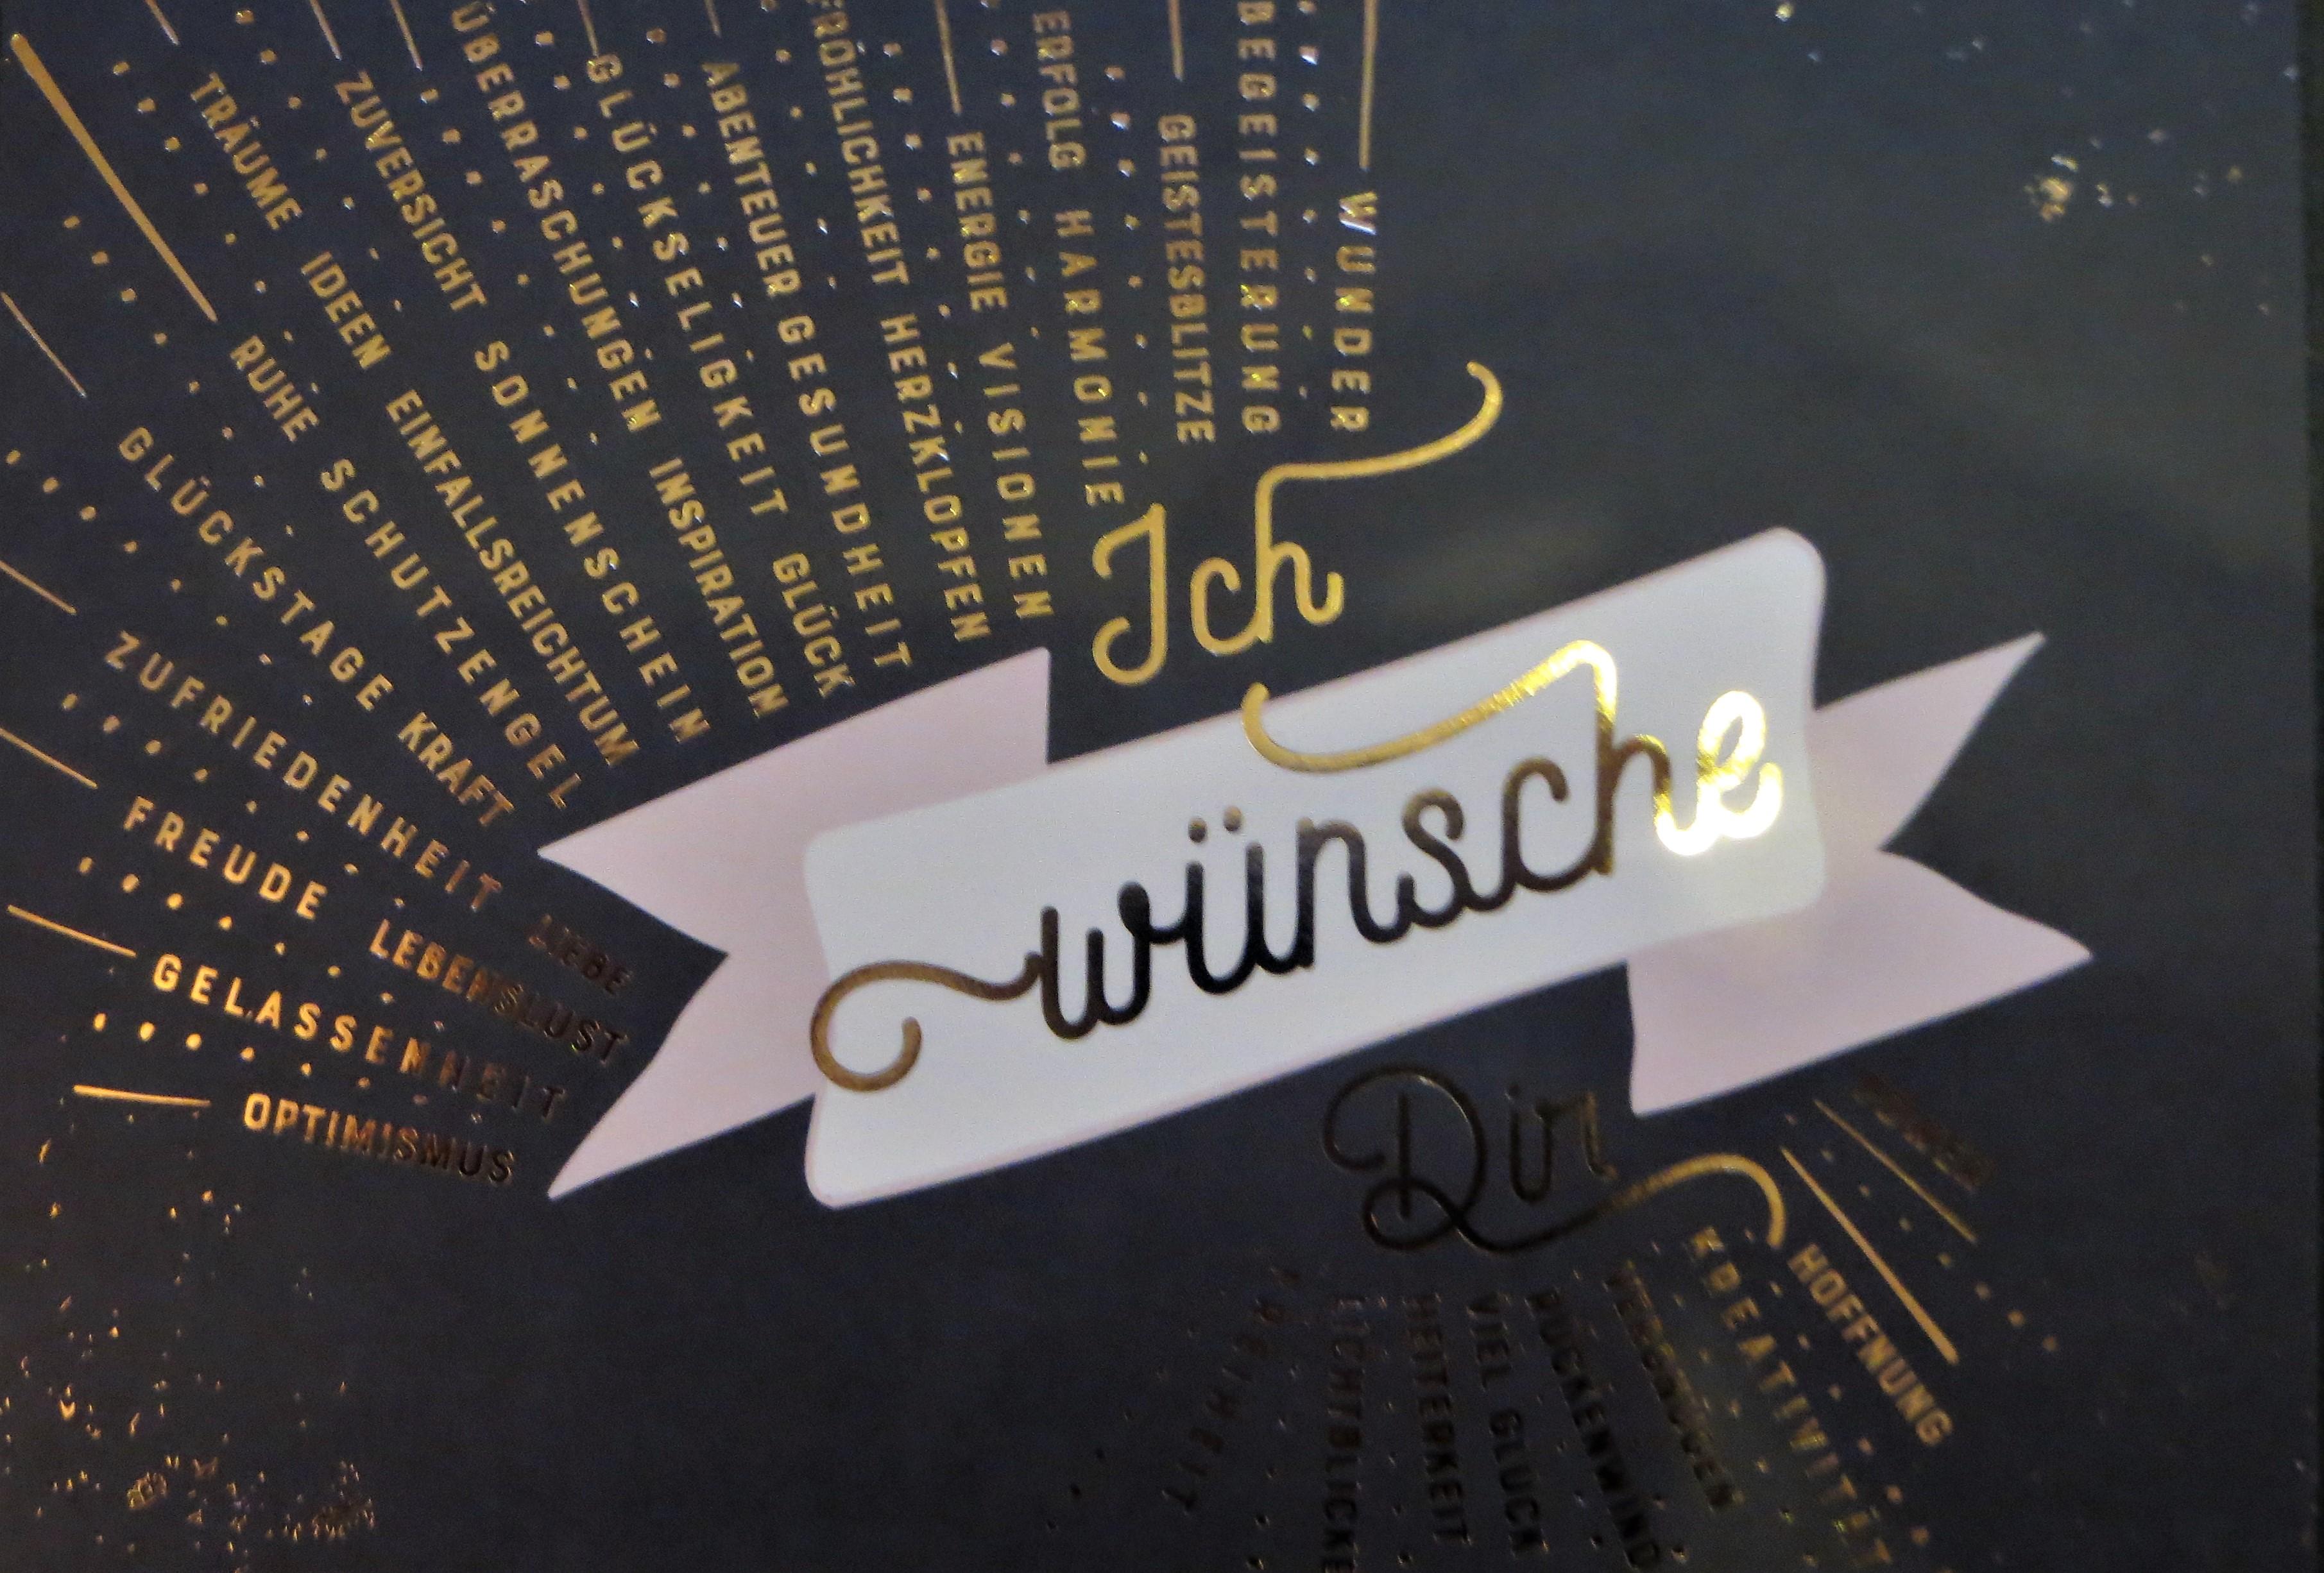 Nützlichgrusskarten - Postkarte Ich wünsche Dir Power Hoffnung Kreativität Vergnügen... VintageArt - Onlineshop Tante Emmer